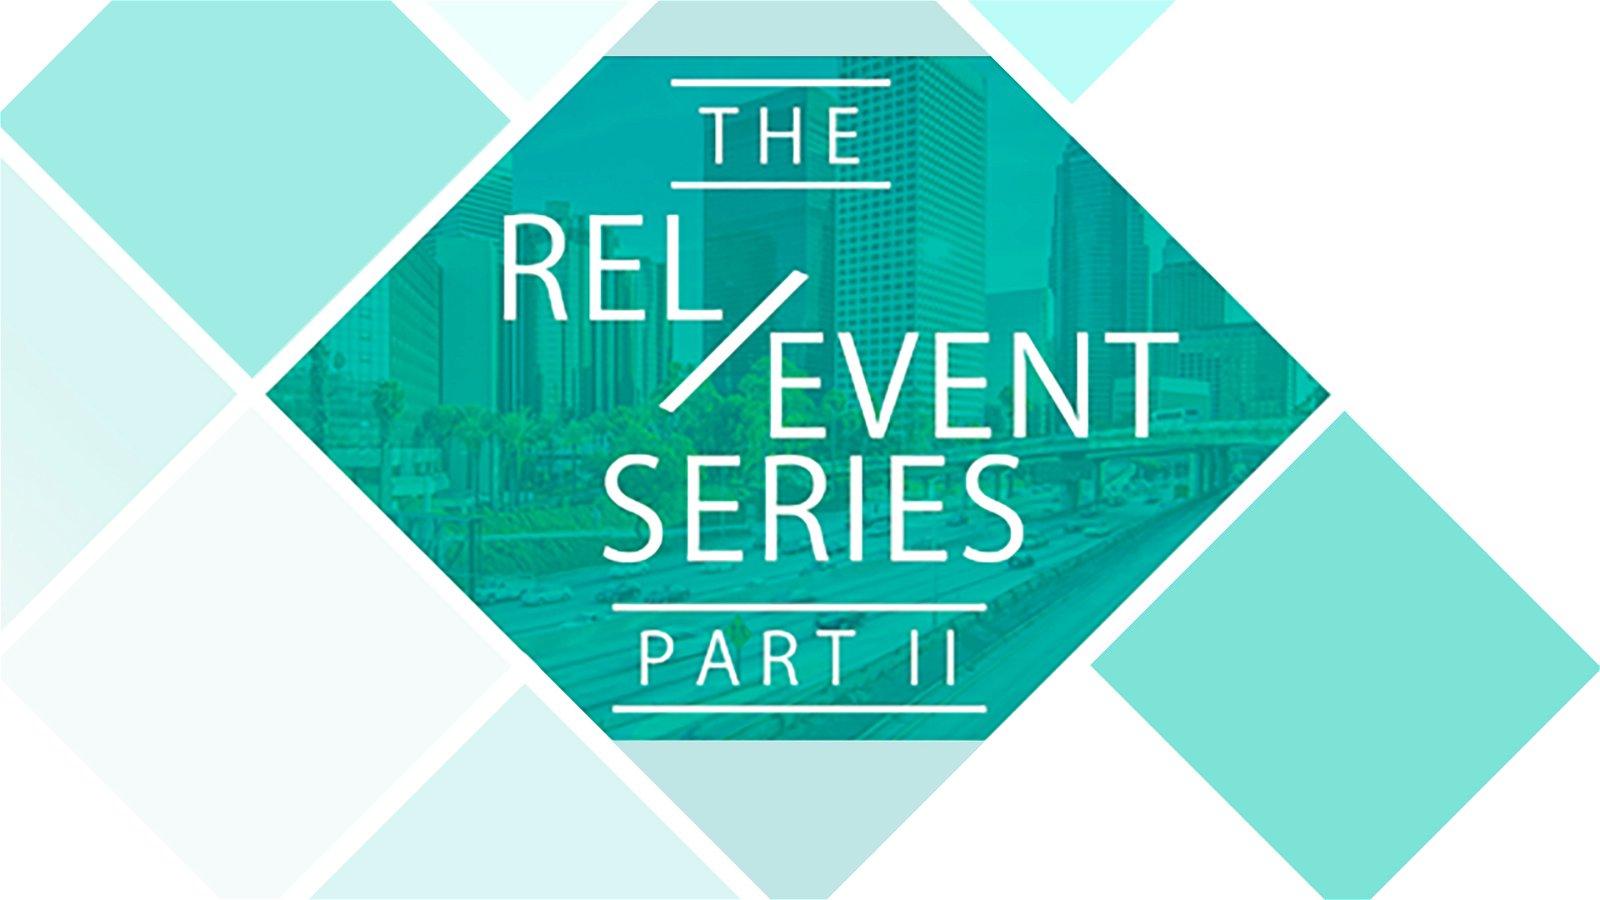 The Rel/Event Series Part II Hits a Theatre April 8 4